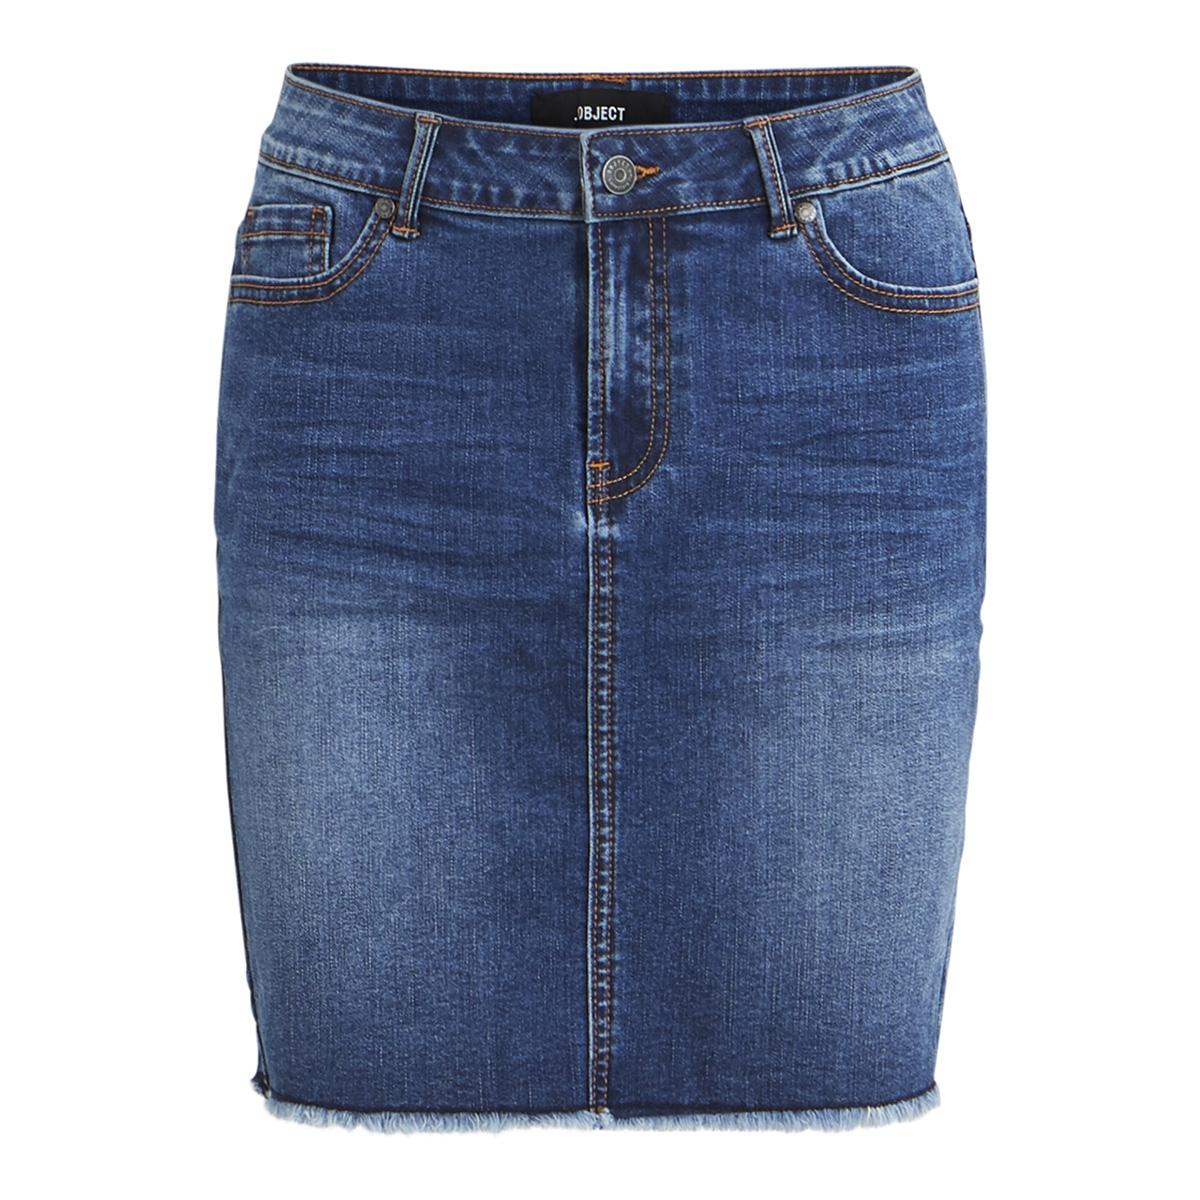 objsarah mw skirt dark blue 101 div 23029854 object rok dark blue denim